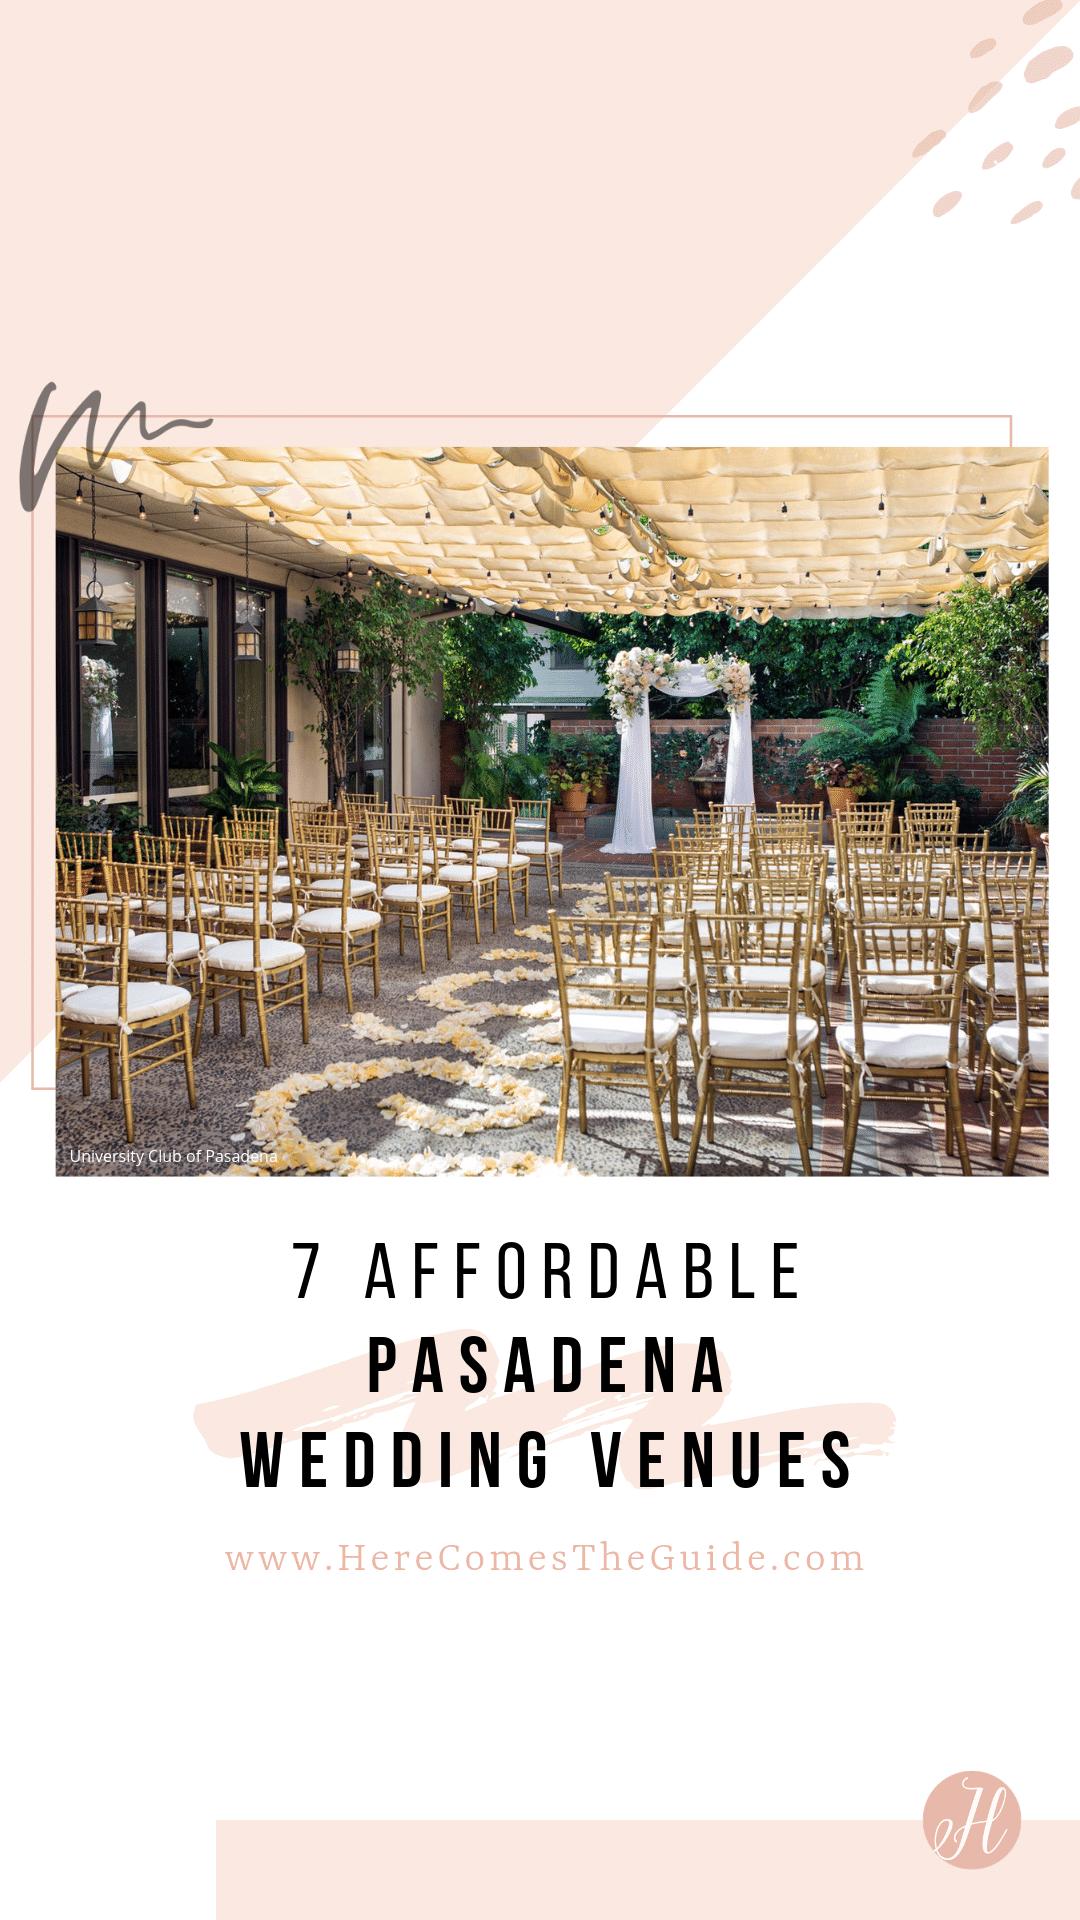 7 Affordable Pasadena Wedding Venues See Prices California Wedding Southern California Outdoor Wedding Venues California California Venues